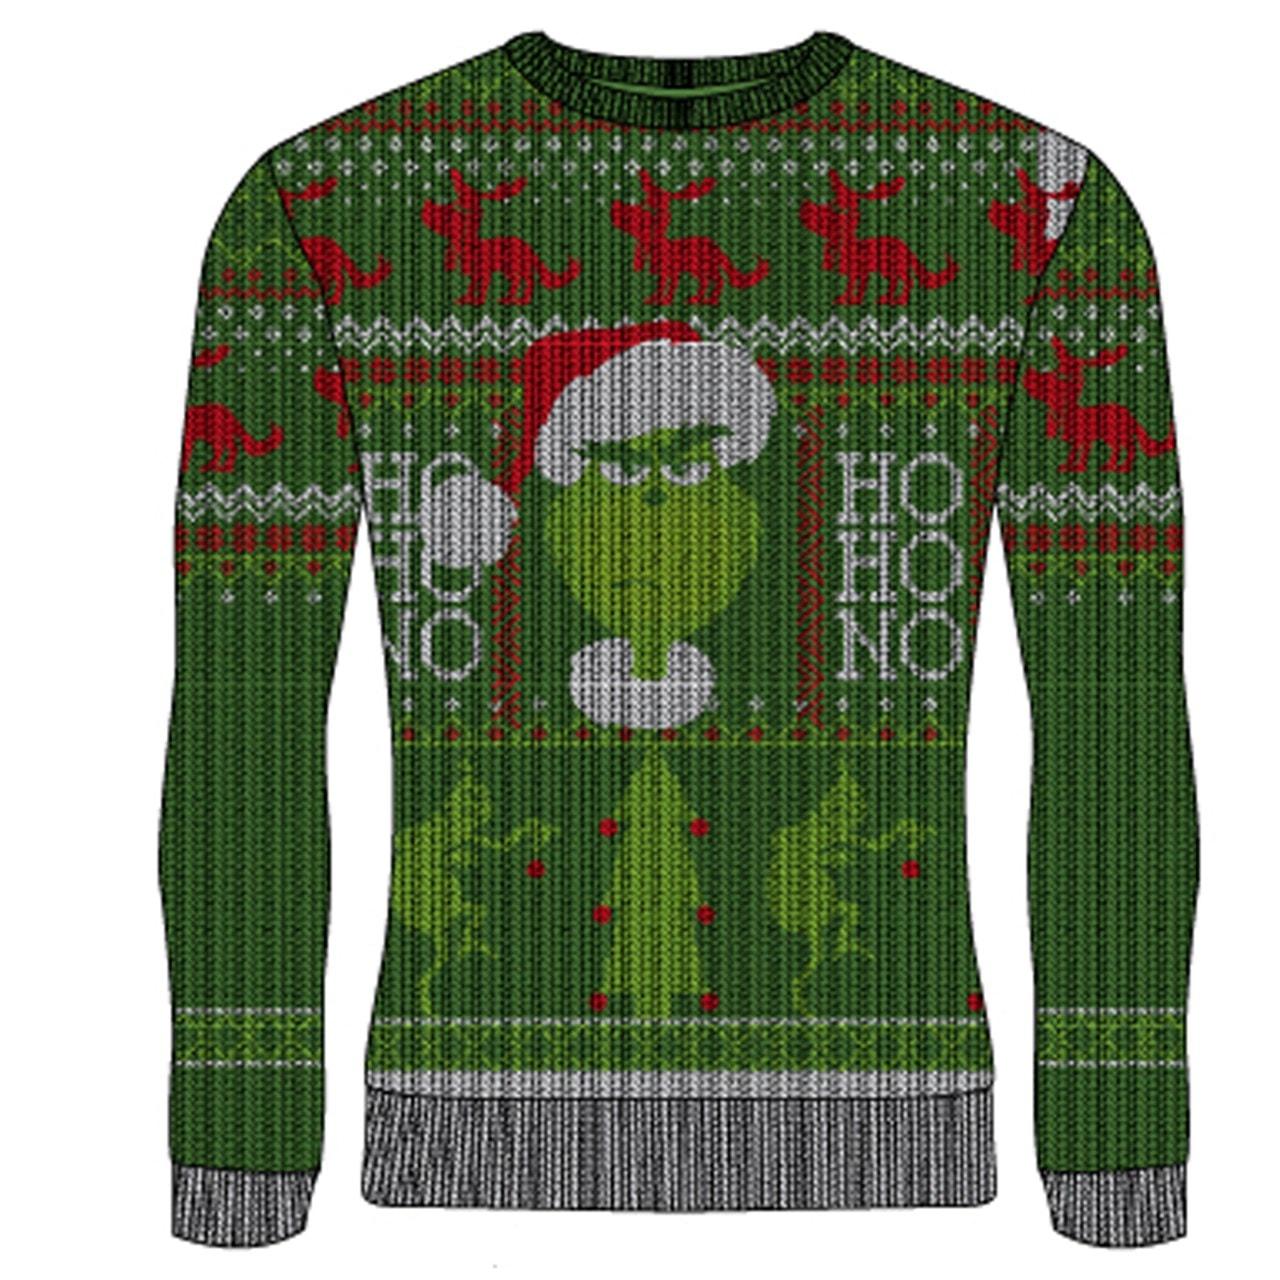 The Grinch: Ho Ho No Christmas Jumper (Small) - 1